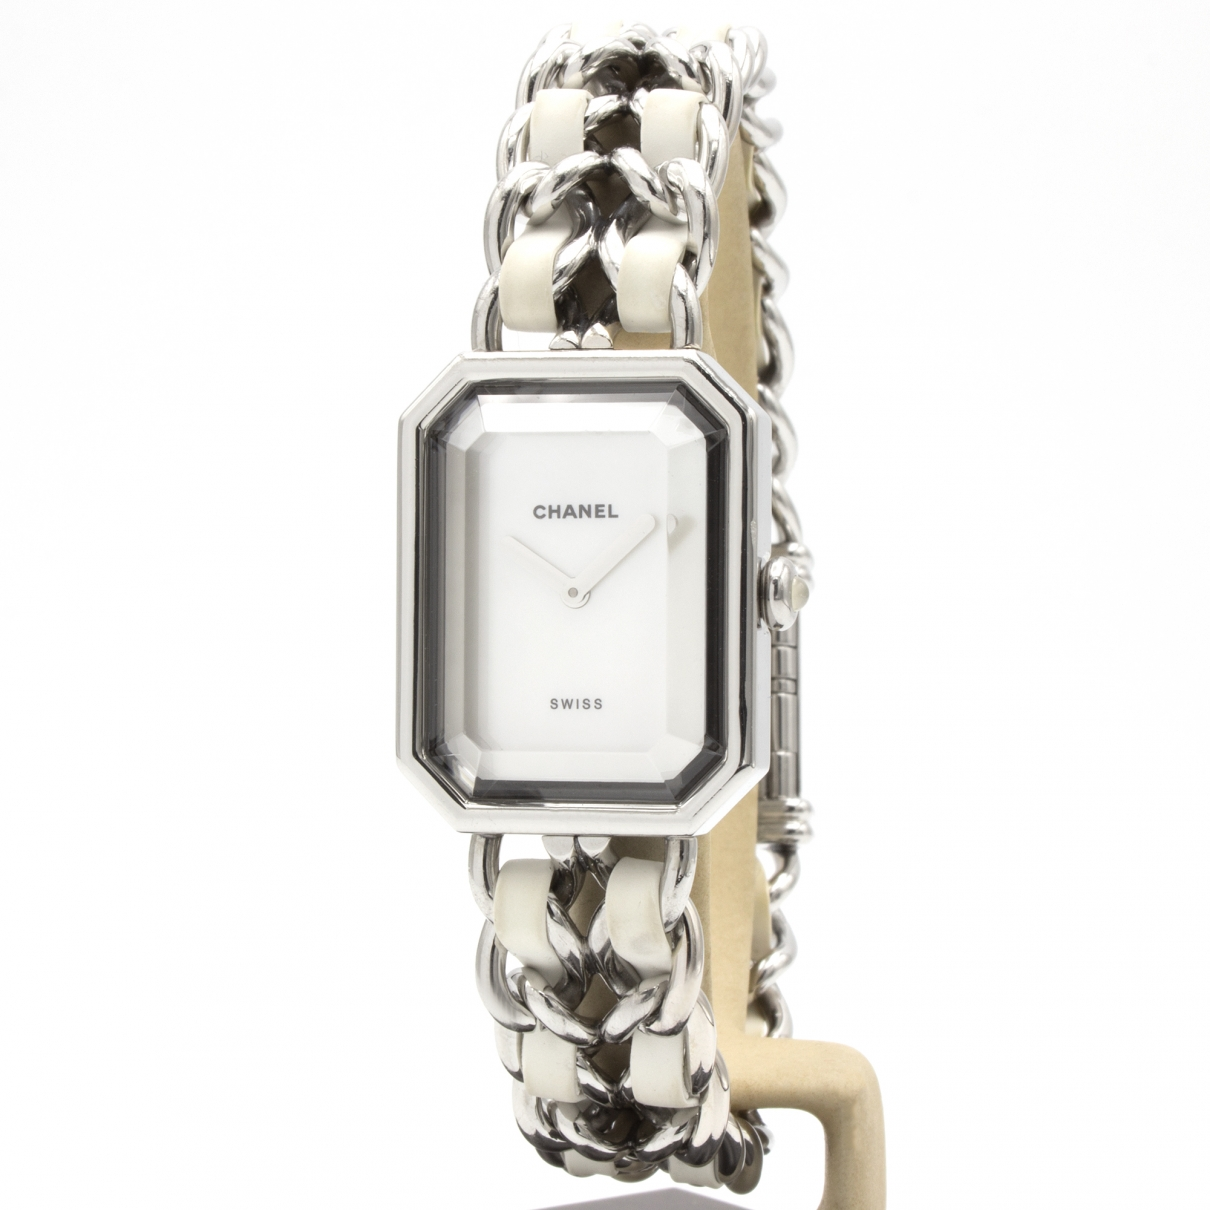 Chanel Premiere Rock Uhr in  Silber Stahl